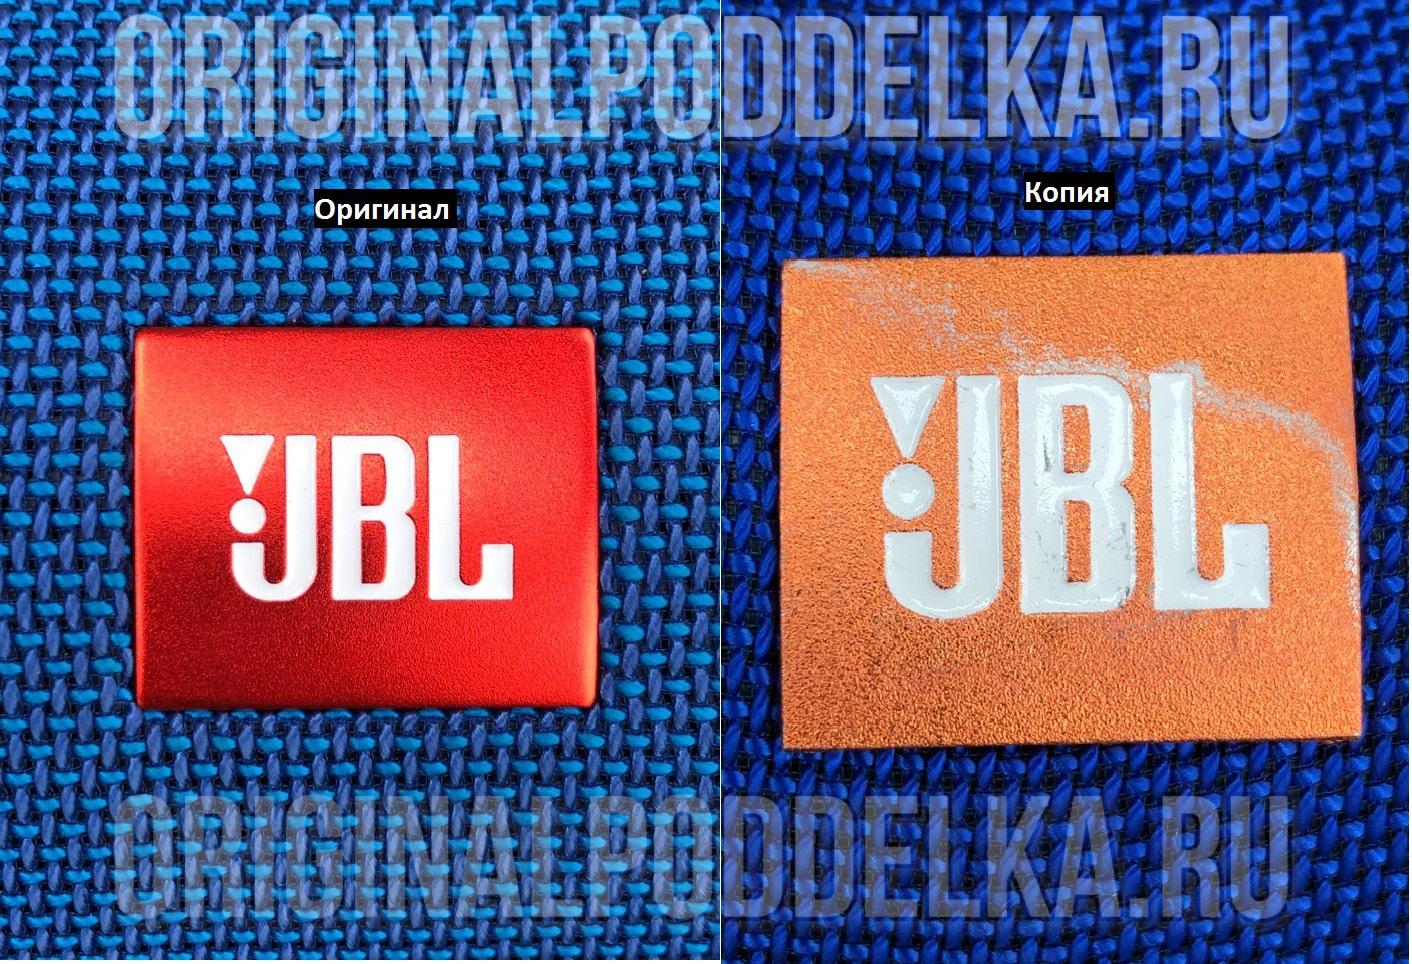 Надпись JBL на подделке